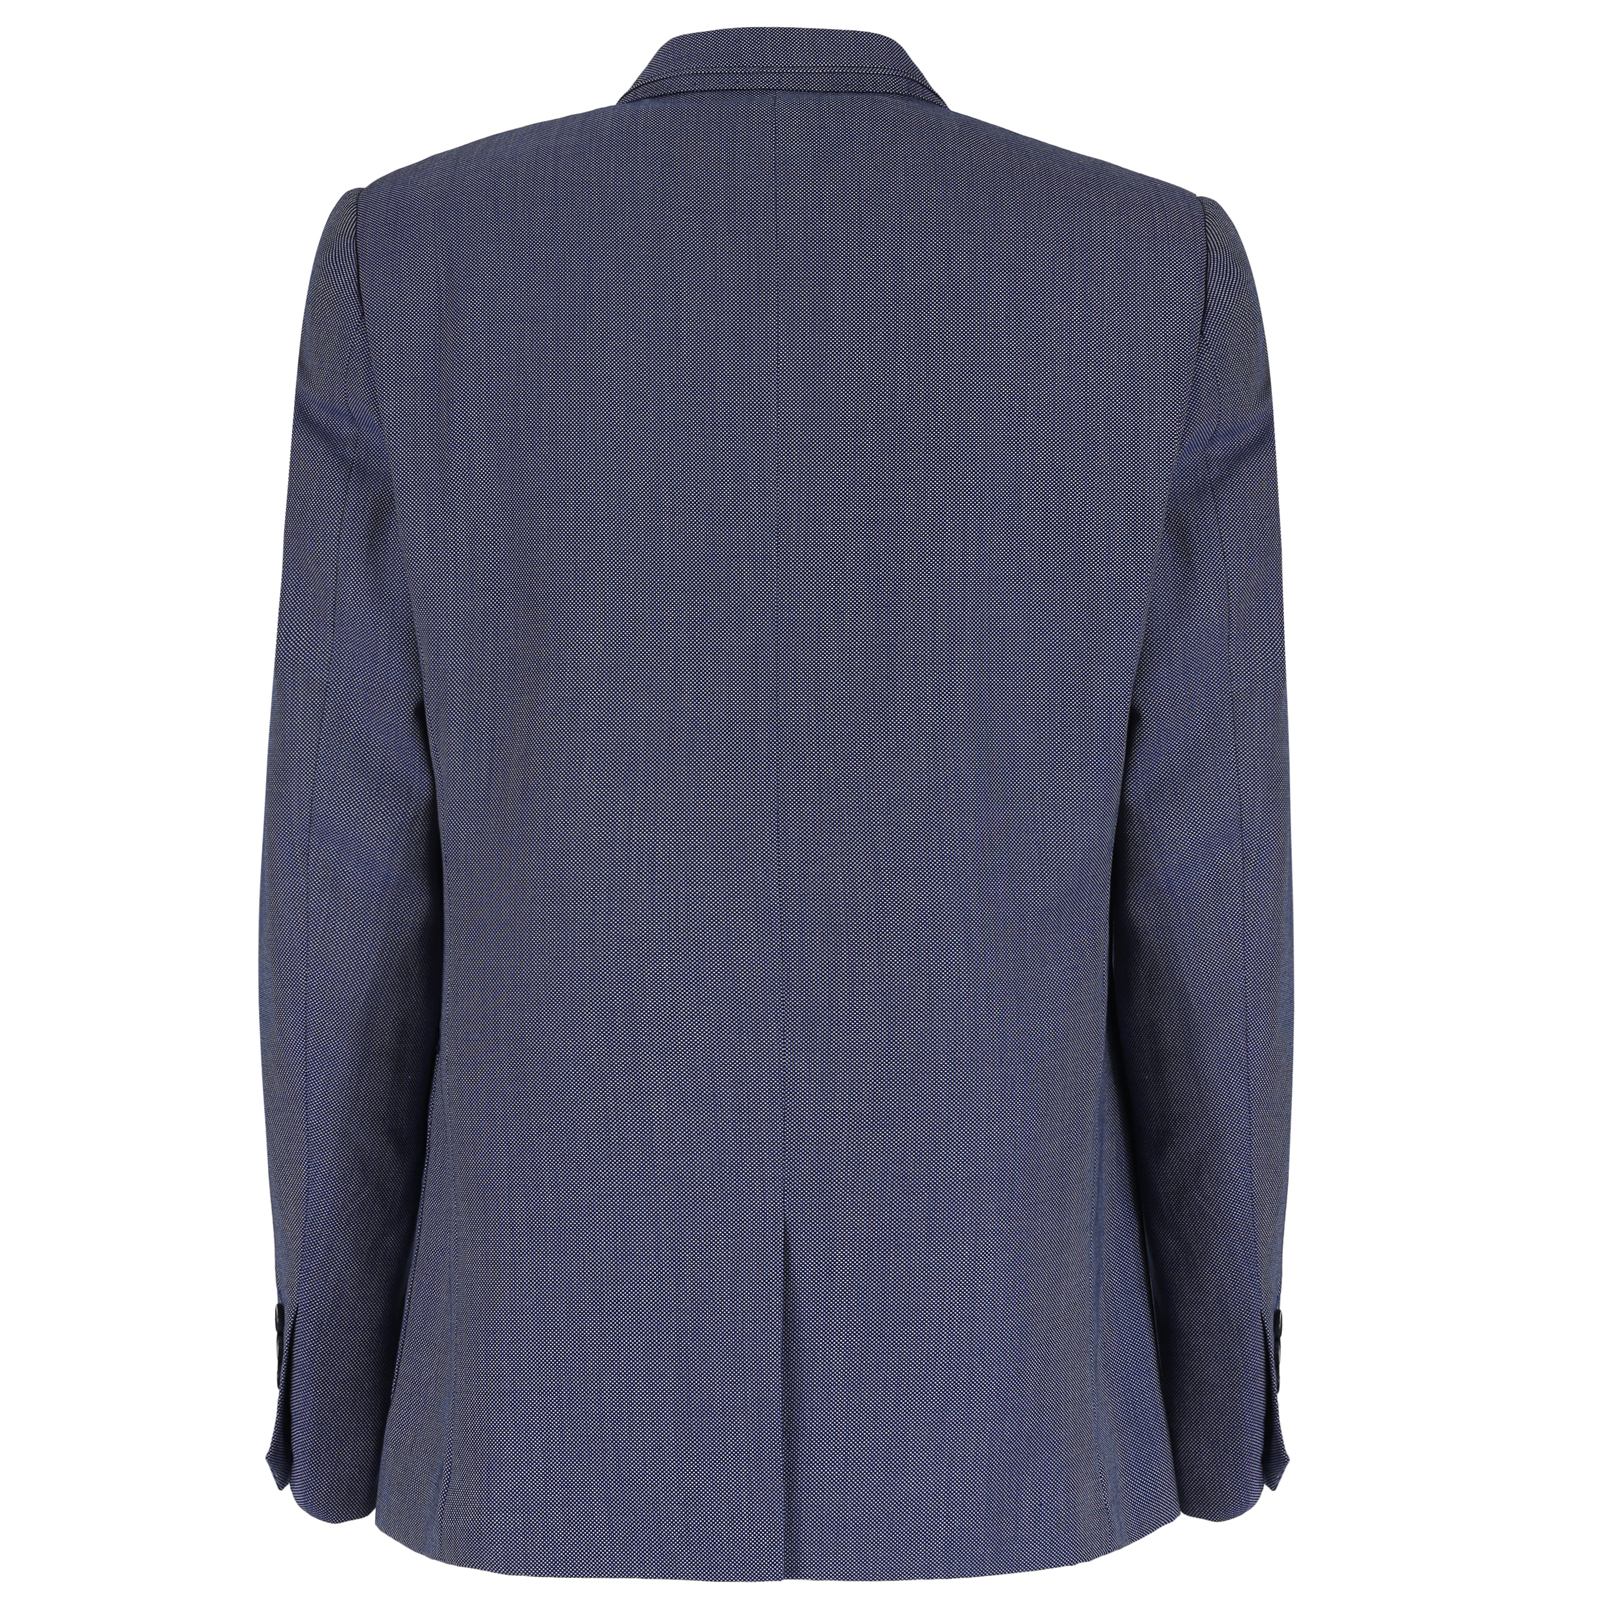 cavani veste de costume avec coudi res tweed homme marron bleu ebay. Black Bedroom Furniture Sets. Home Design Ideas